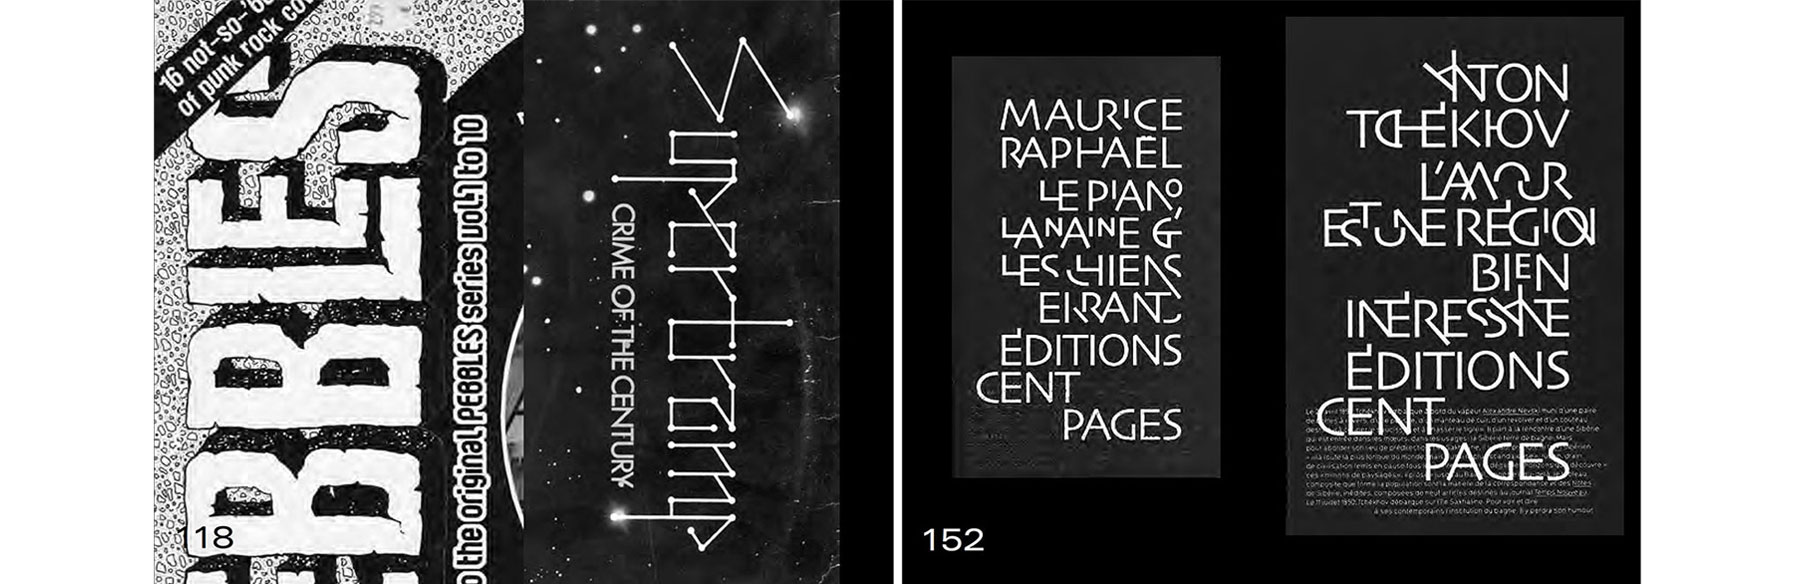 Ligatures-Daniel-Hattenschwiller-Thomas-Petit-cover-index-grafik-memoire-ecal-capture05